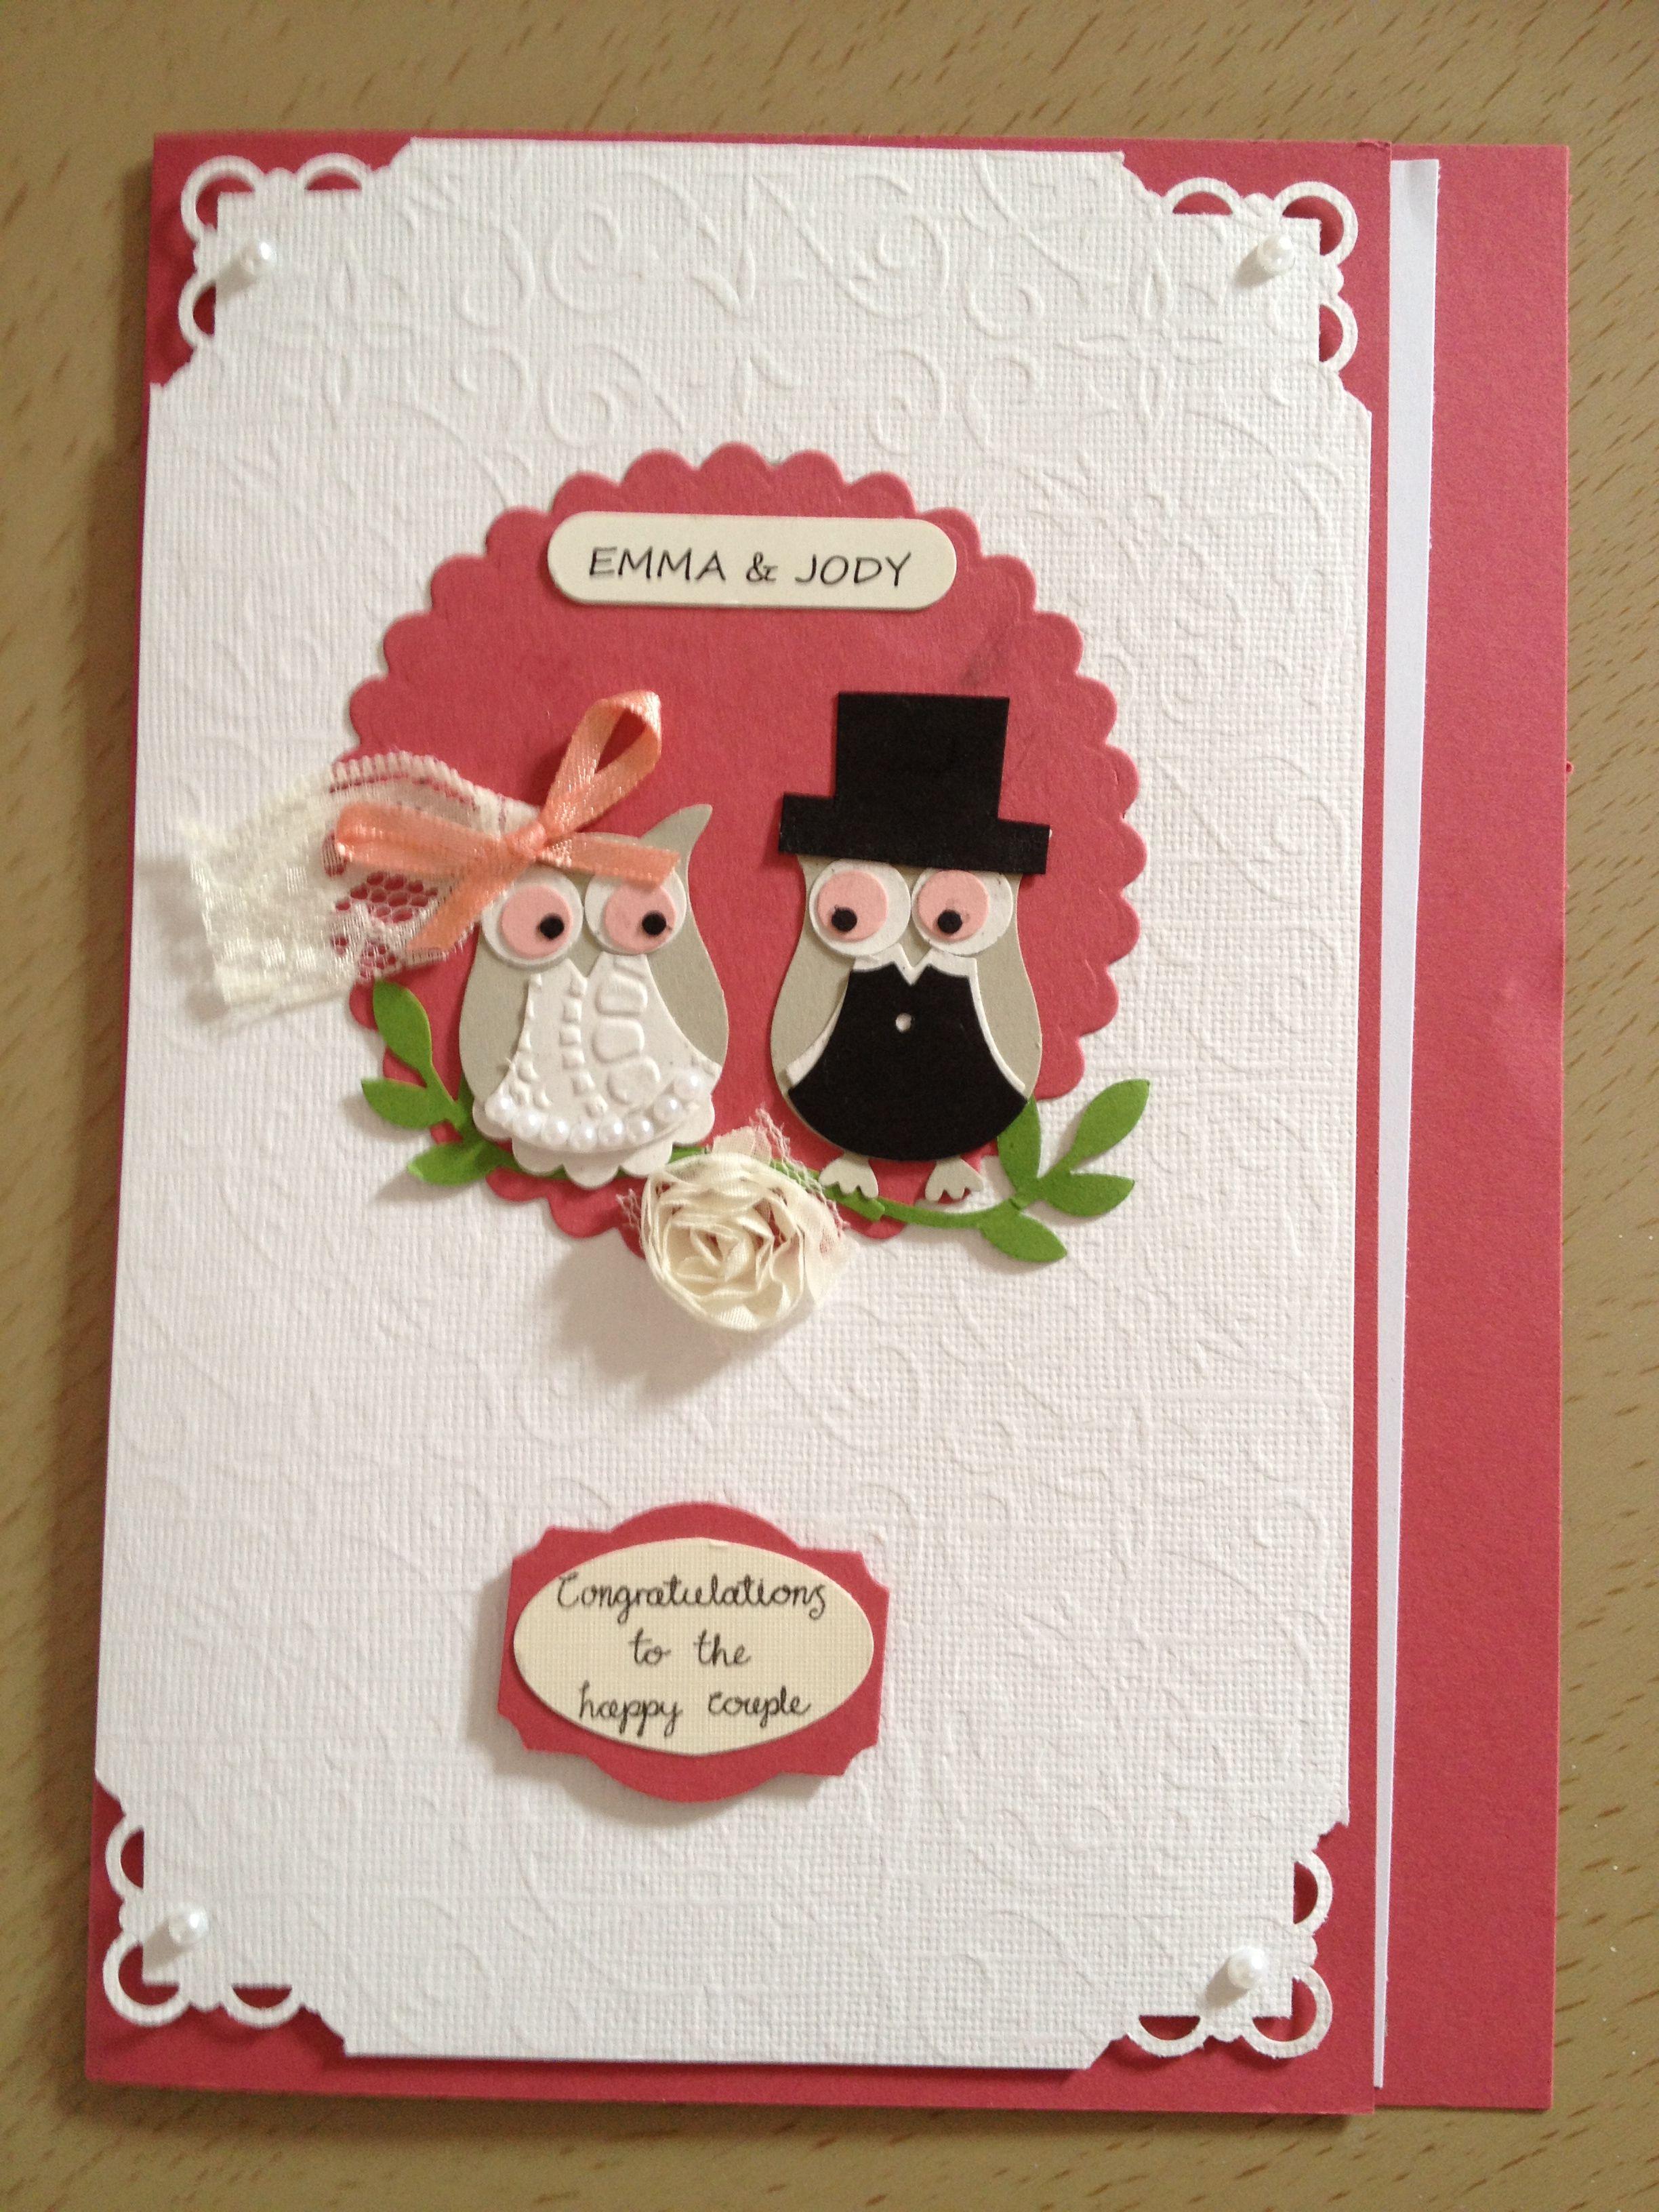 Fantastic Owl Wedding Invitations Composition - Invitations and ...